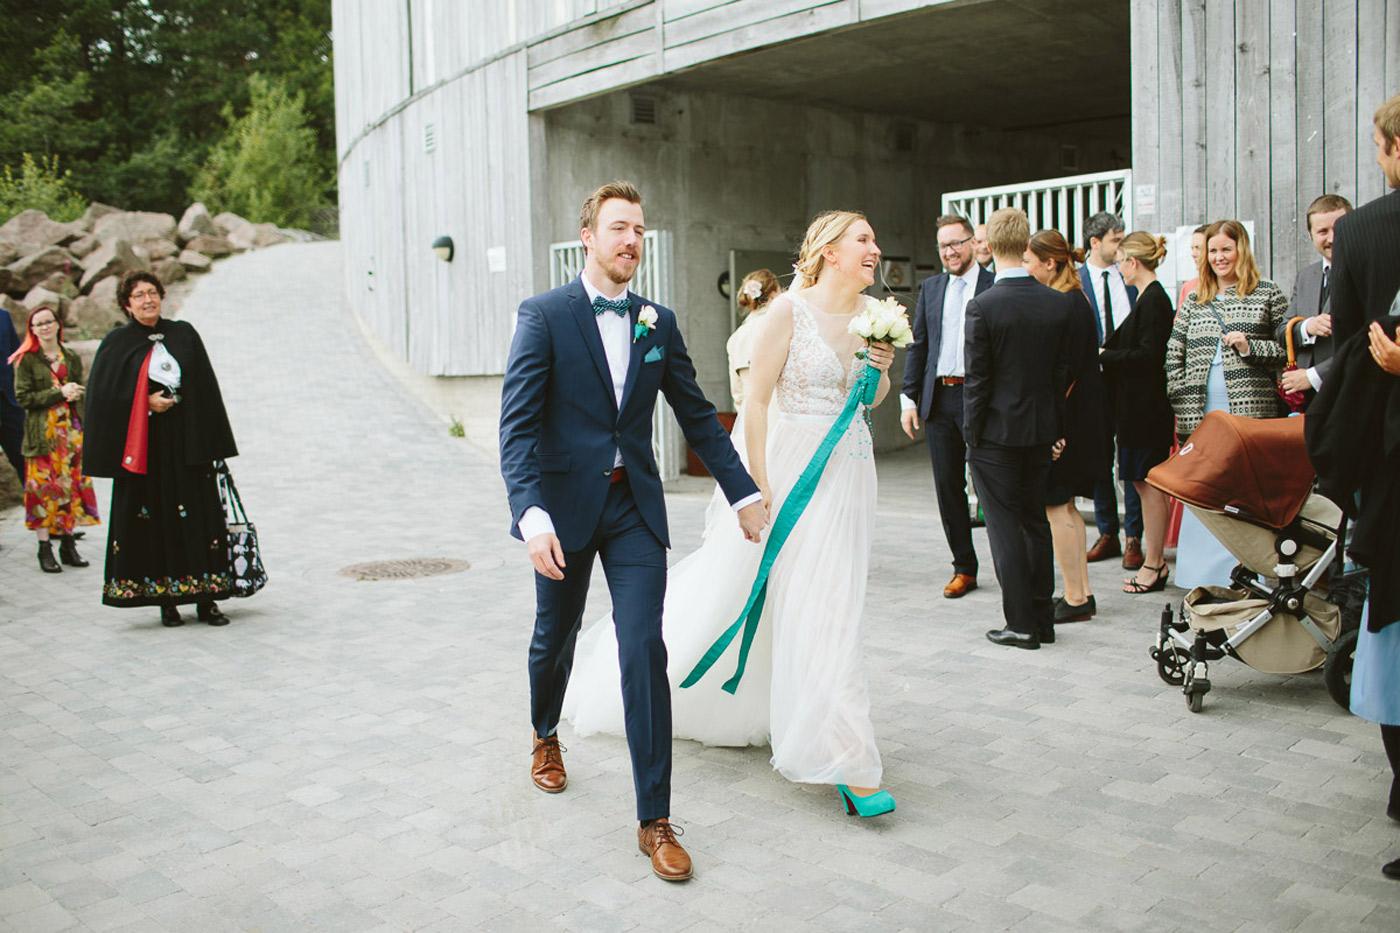 boathouse weddings in norway